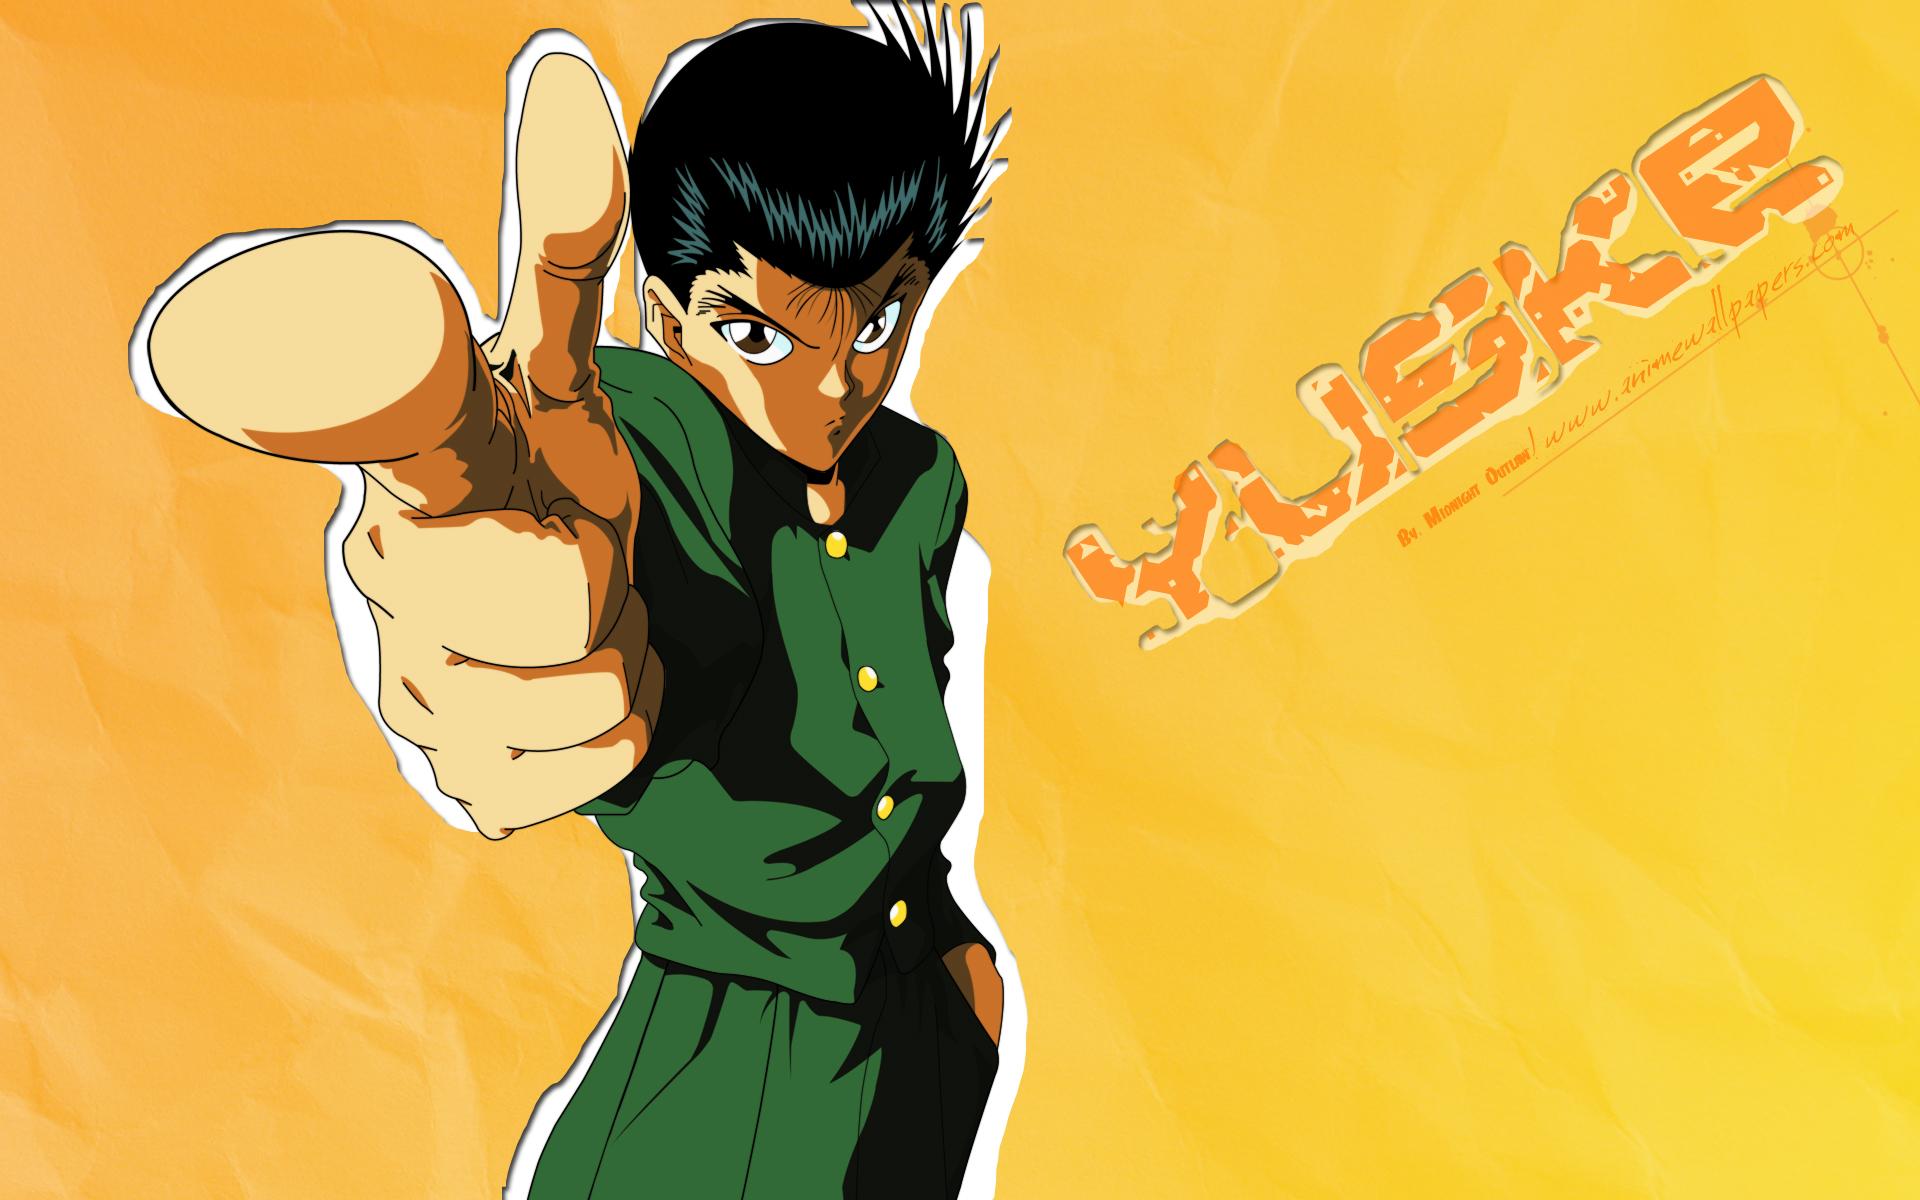 Yuu Yuu Hakusho Anime Wallpaper # 5